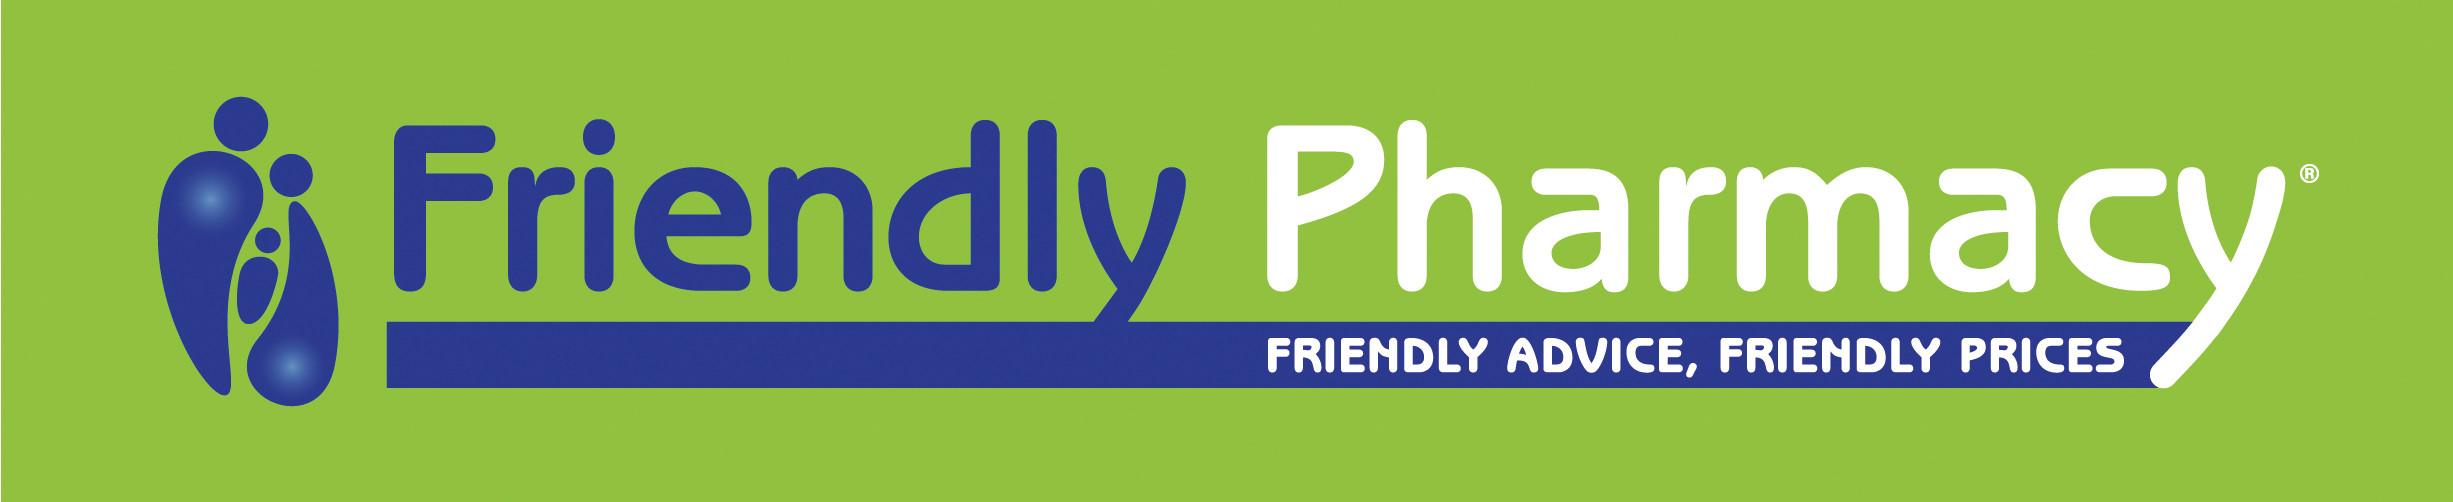 Friendly Pharmacy Green Background R.jpg